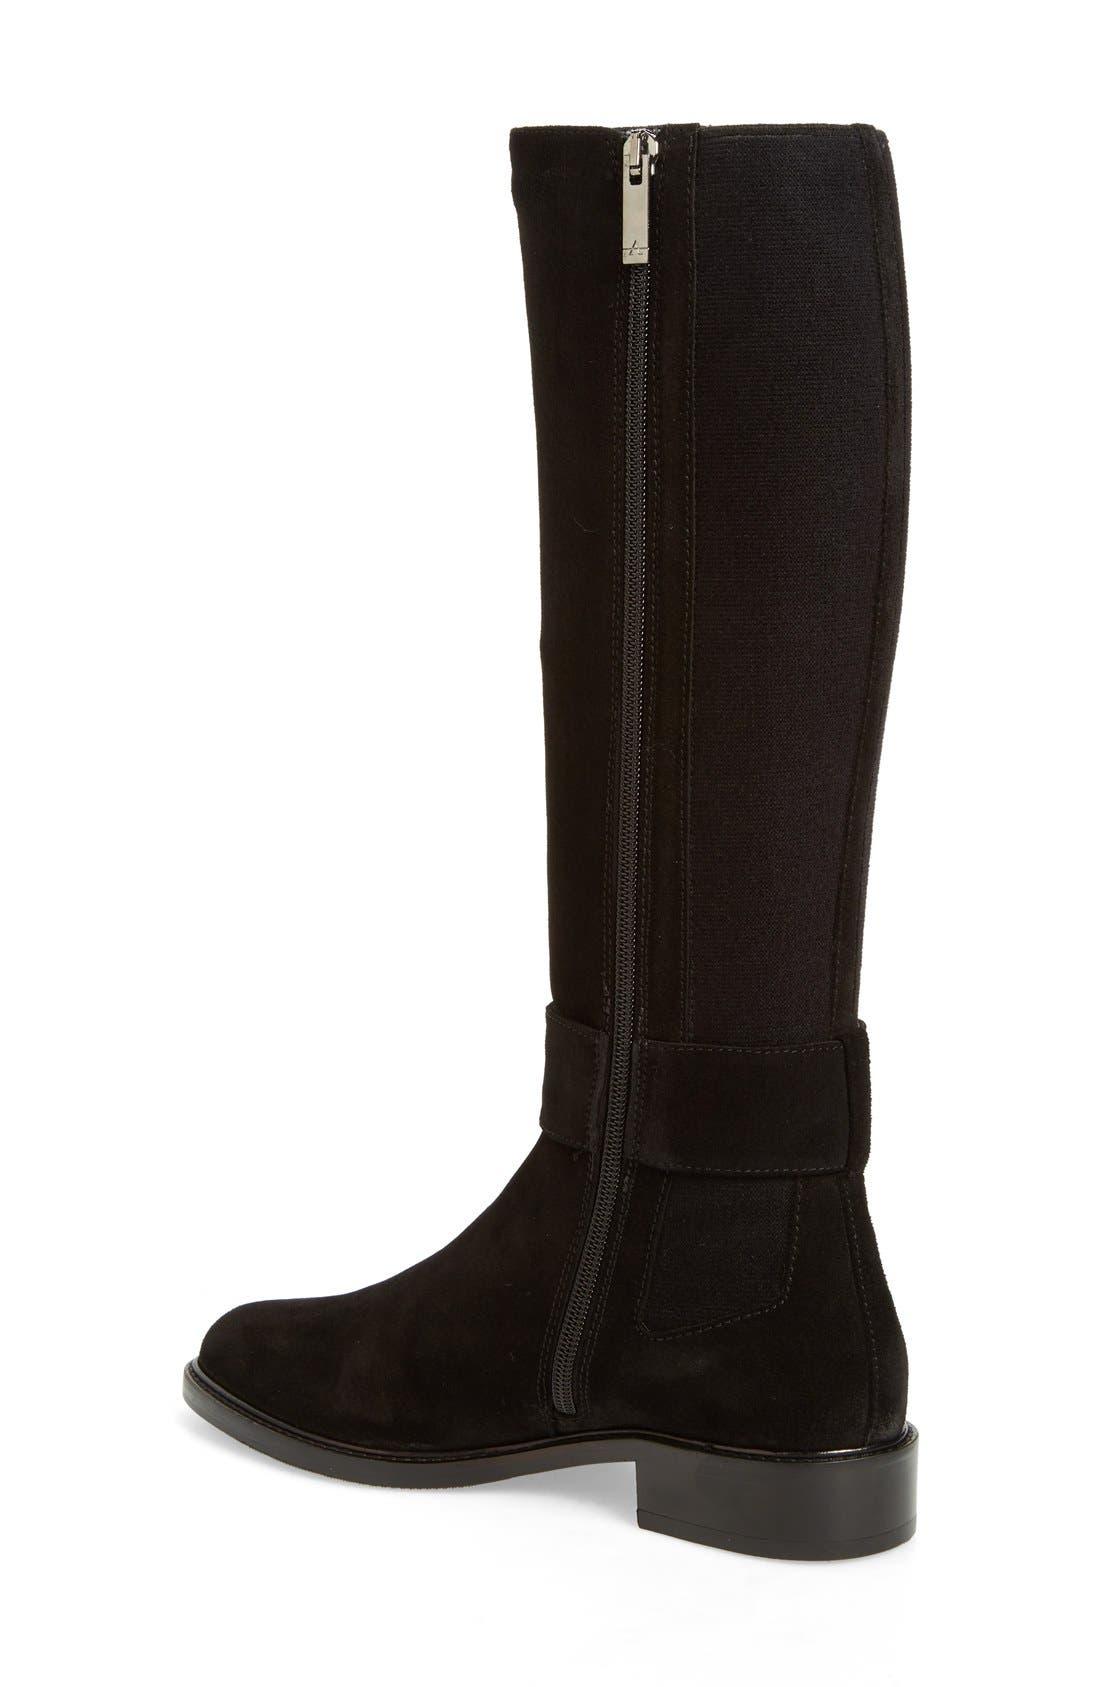 Alternate Image 2  - Aquatalia 'Giada' Weatherproof Riding Boot (Women)